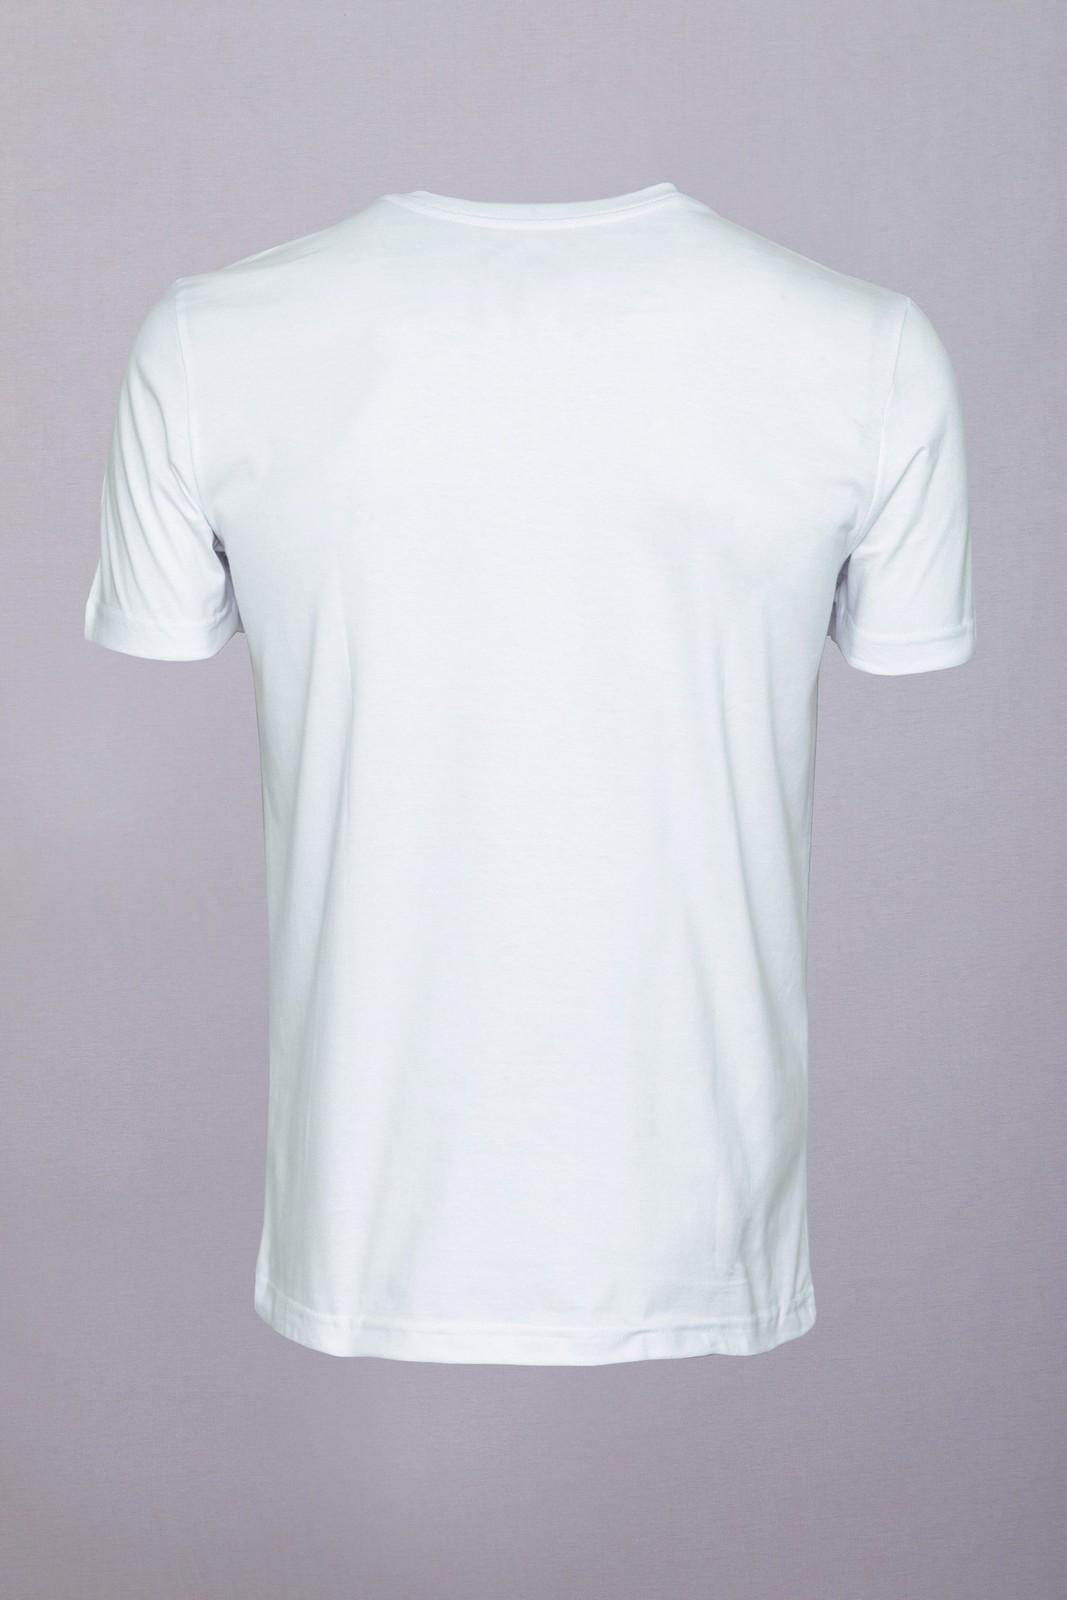 Camiseta CoolWave Básica Branca